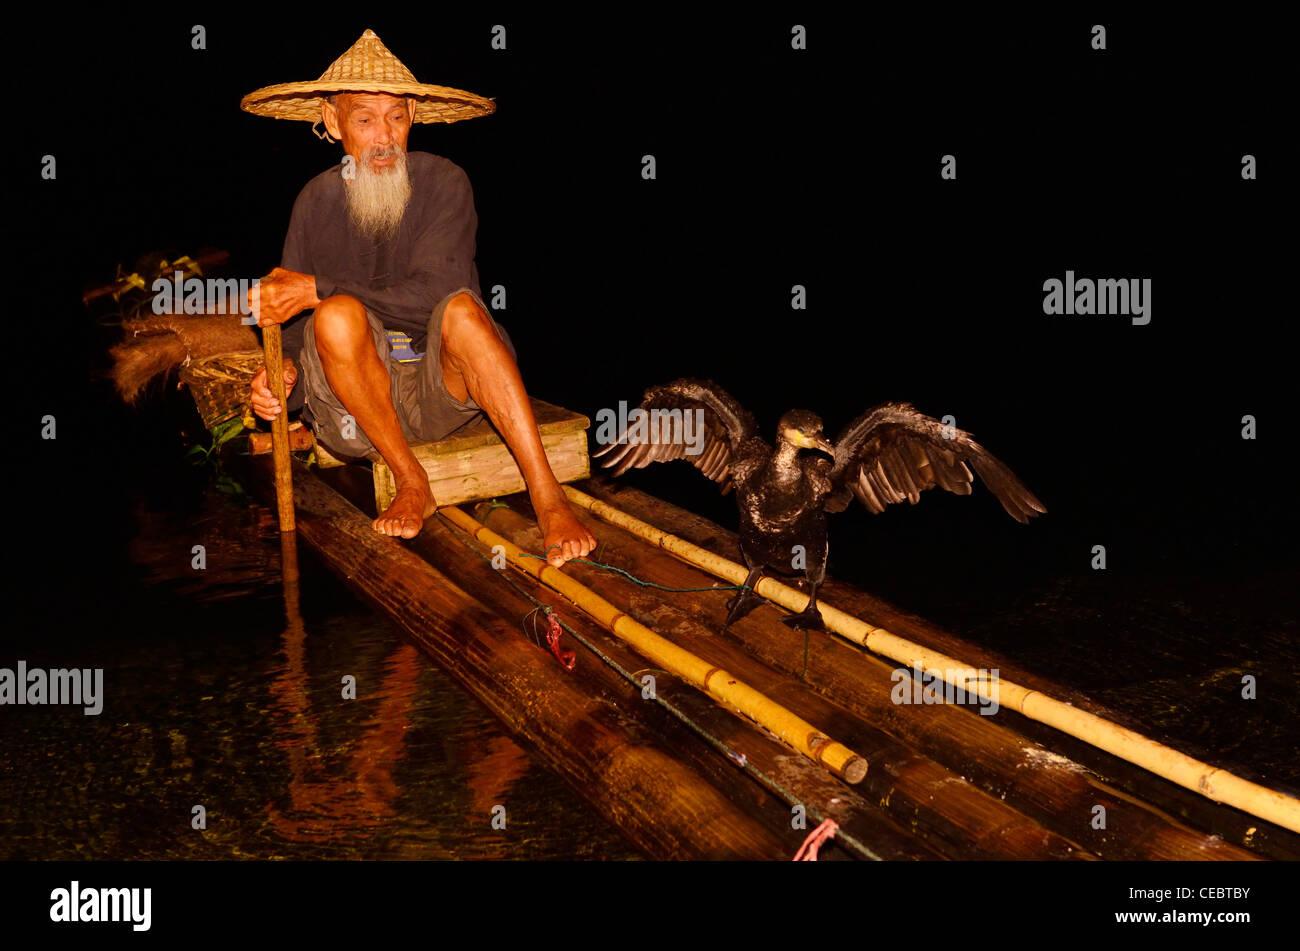 Cormorant fisherman holding bird on a string on a bamboo raft on the Li river at night Xingpingzhen Yangshuo, Guilin, Guangxi China Stock Photo